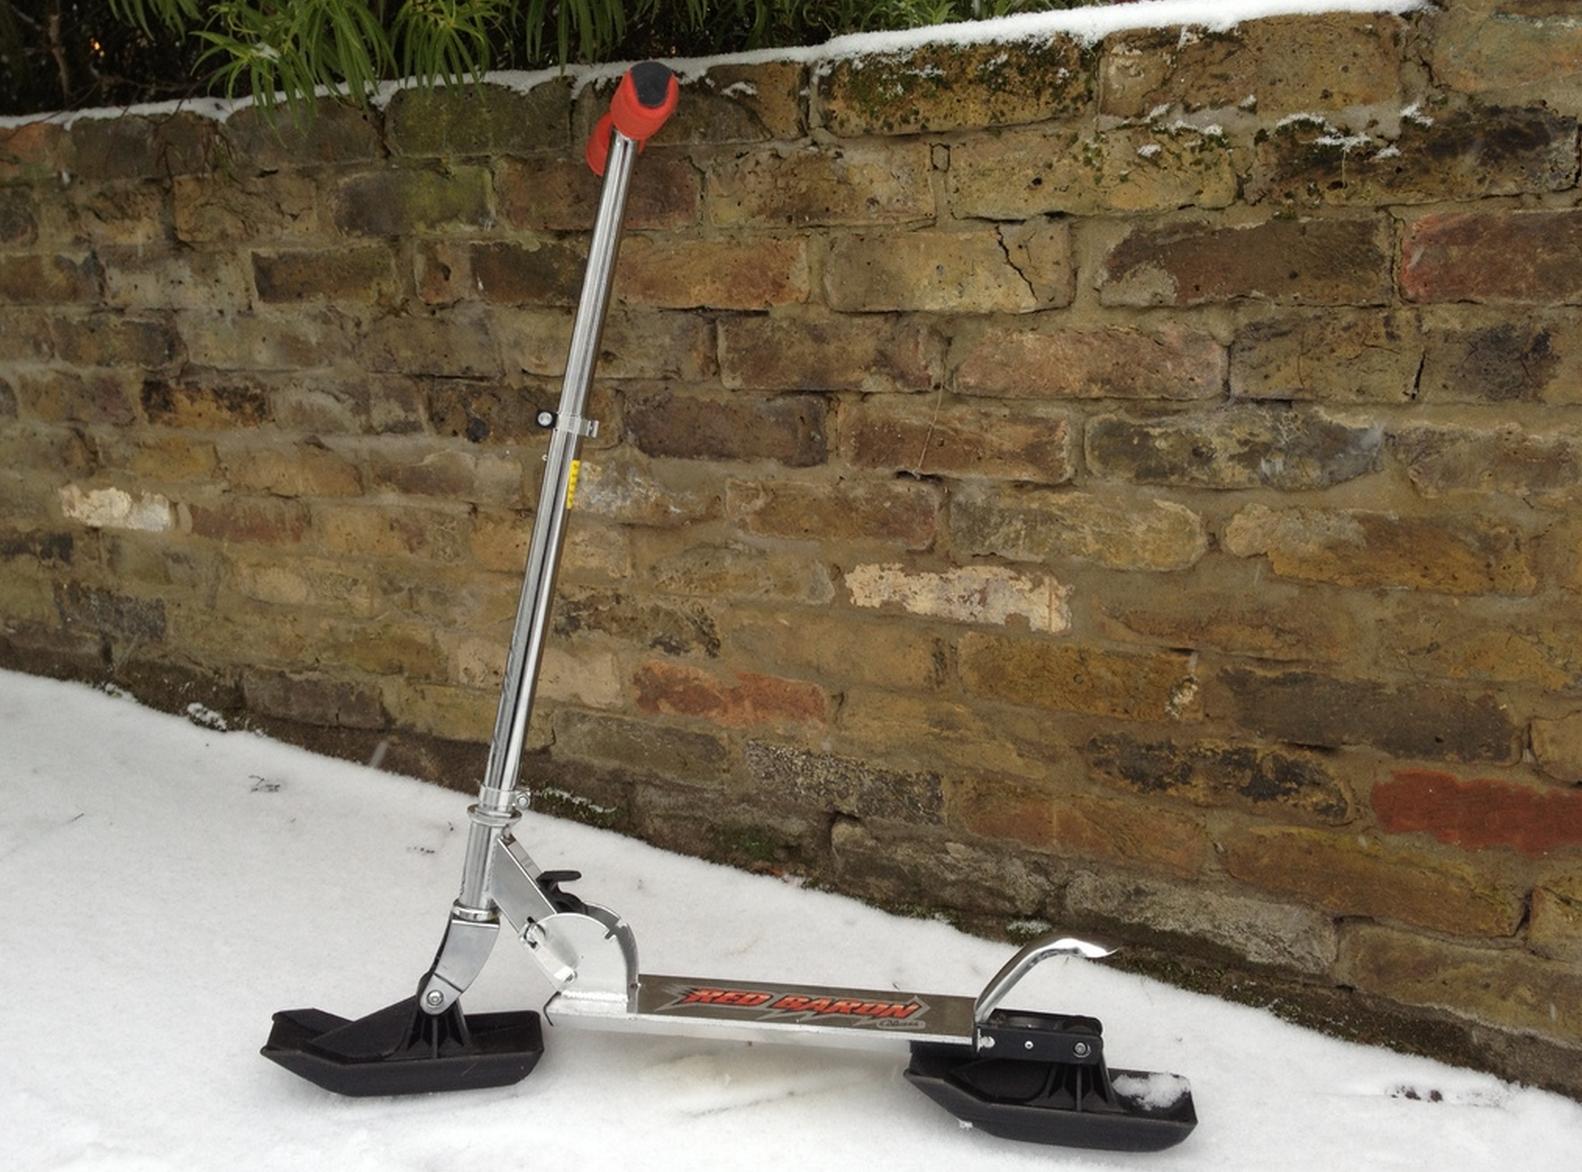 razor scooter sled